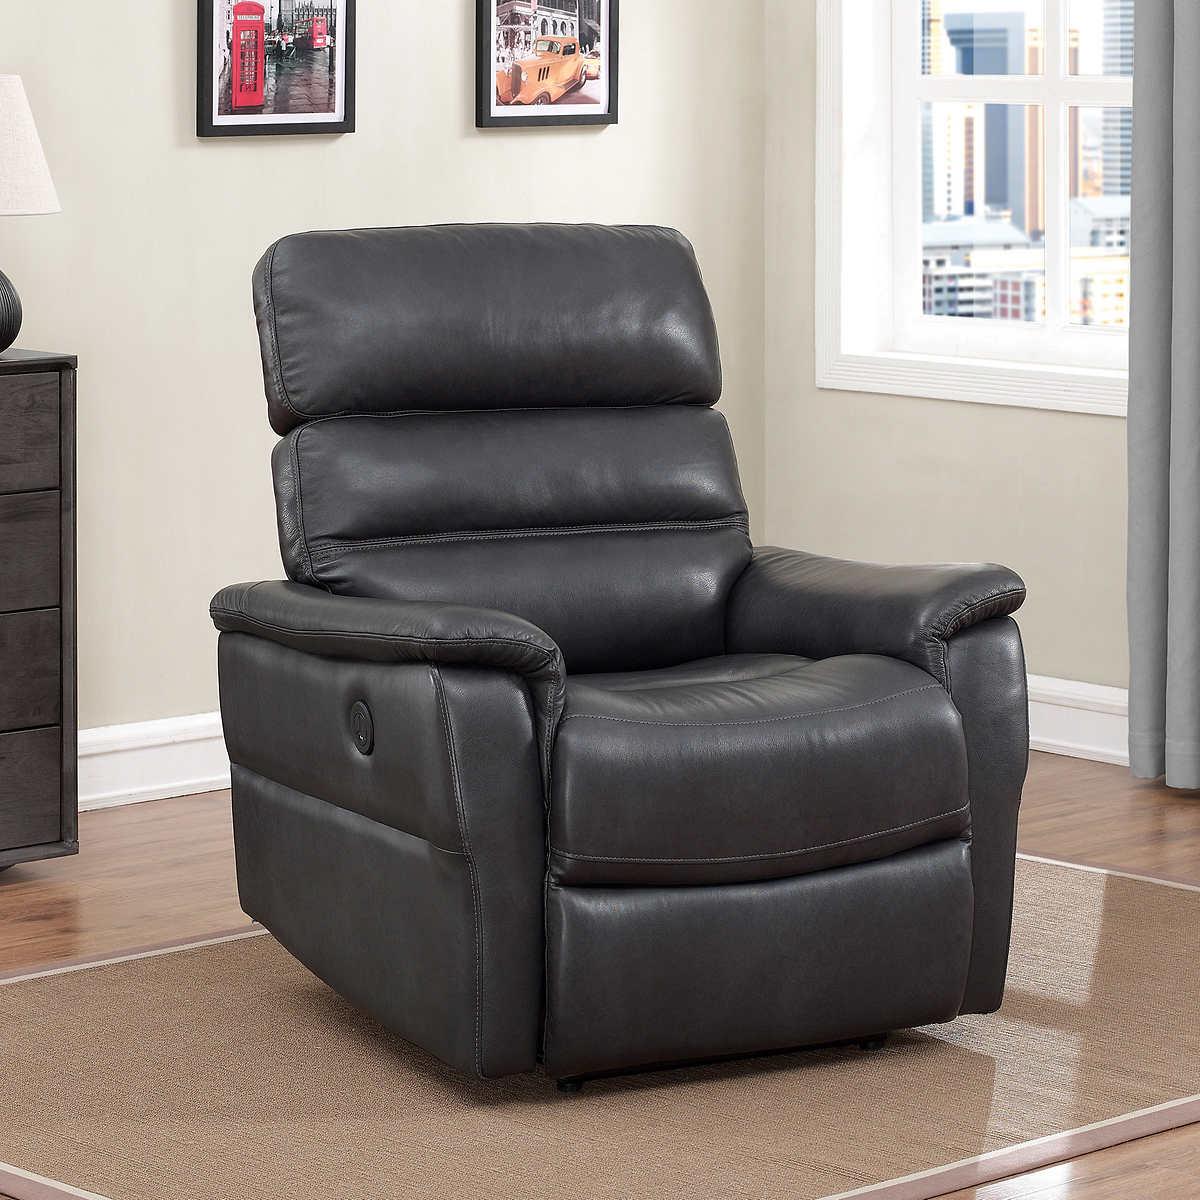 clifton top grain leather power recliner charcoal gray. Interior Design Ideas. Home Design Ideas